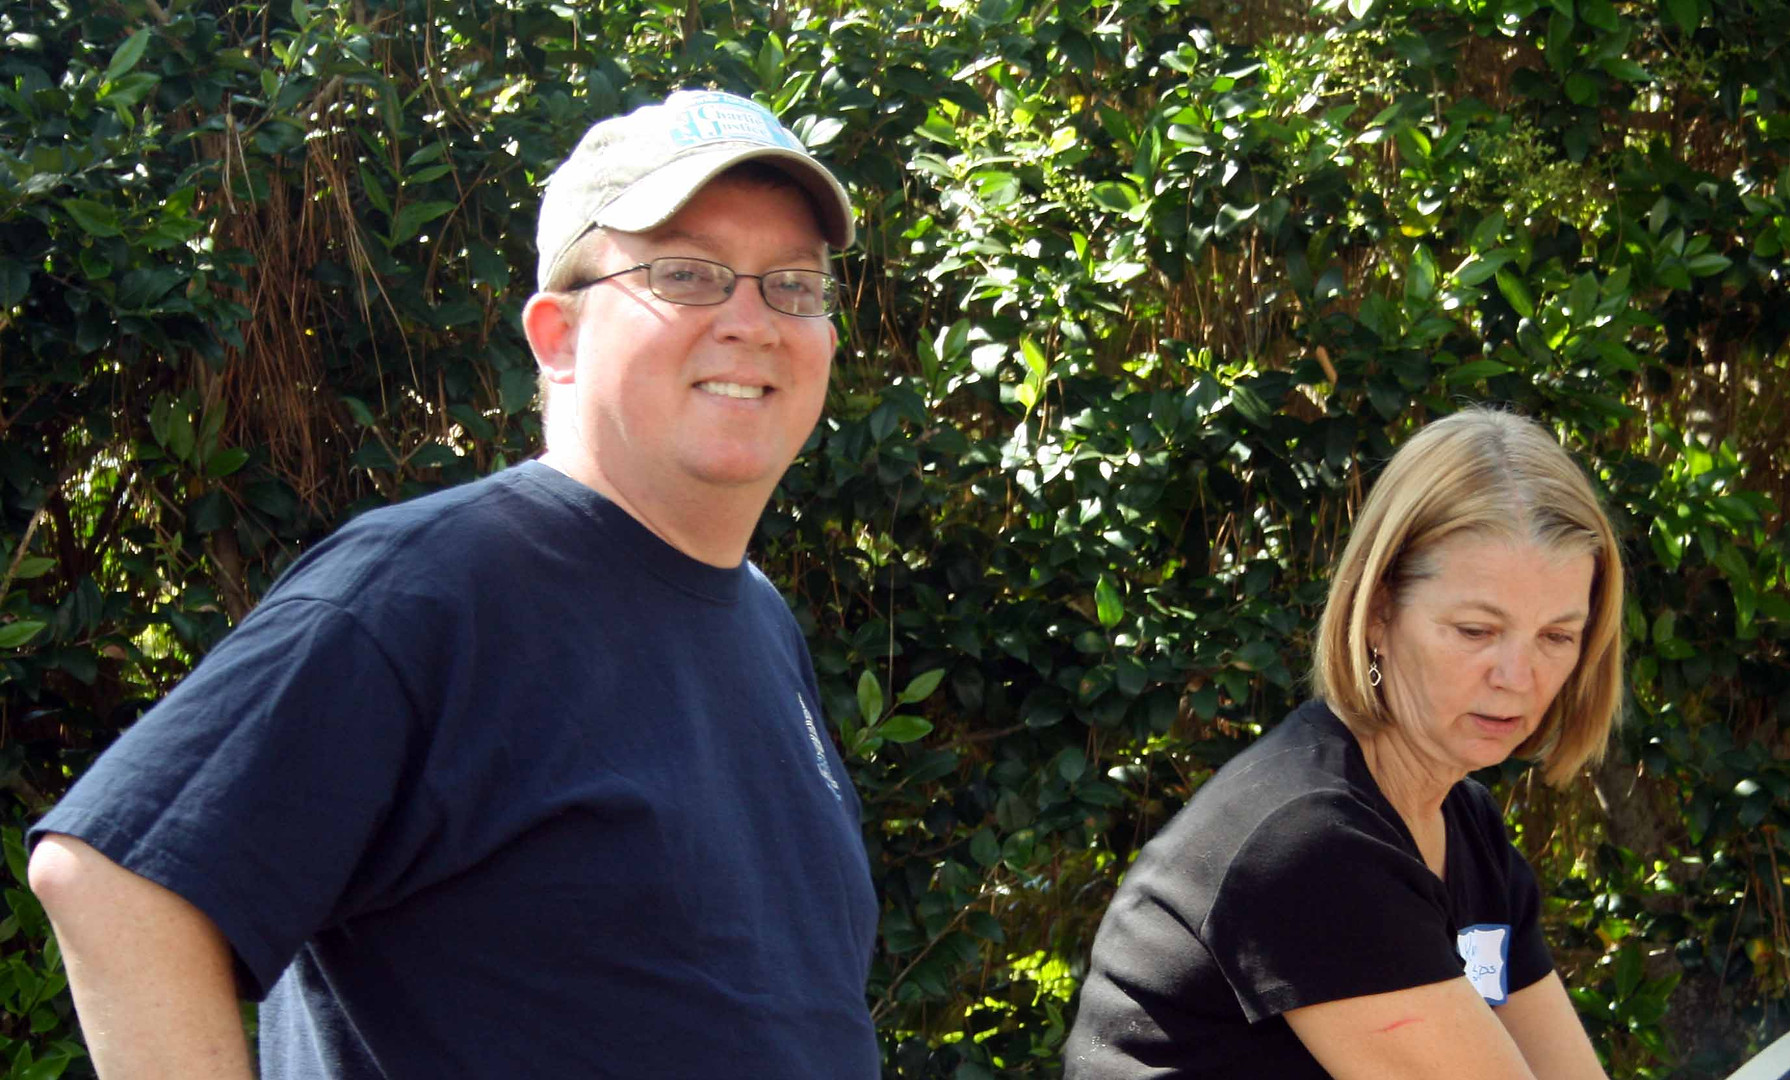 Charlie and Kathy.JPG